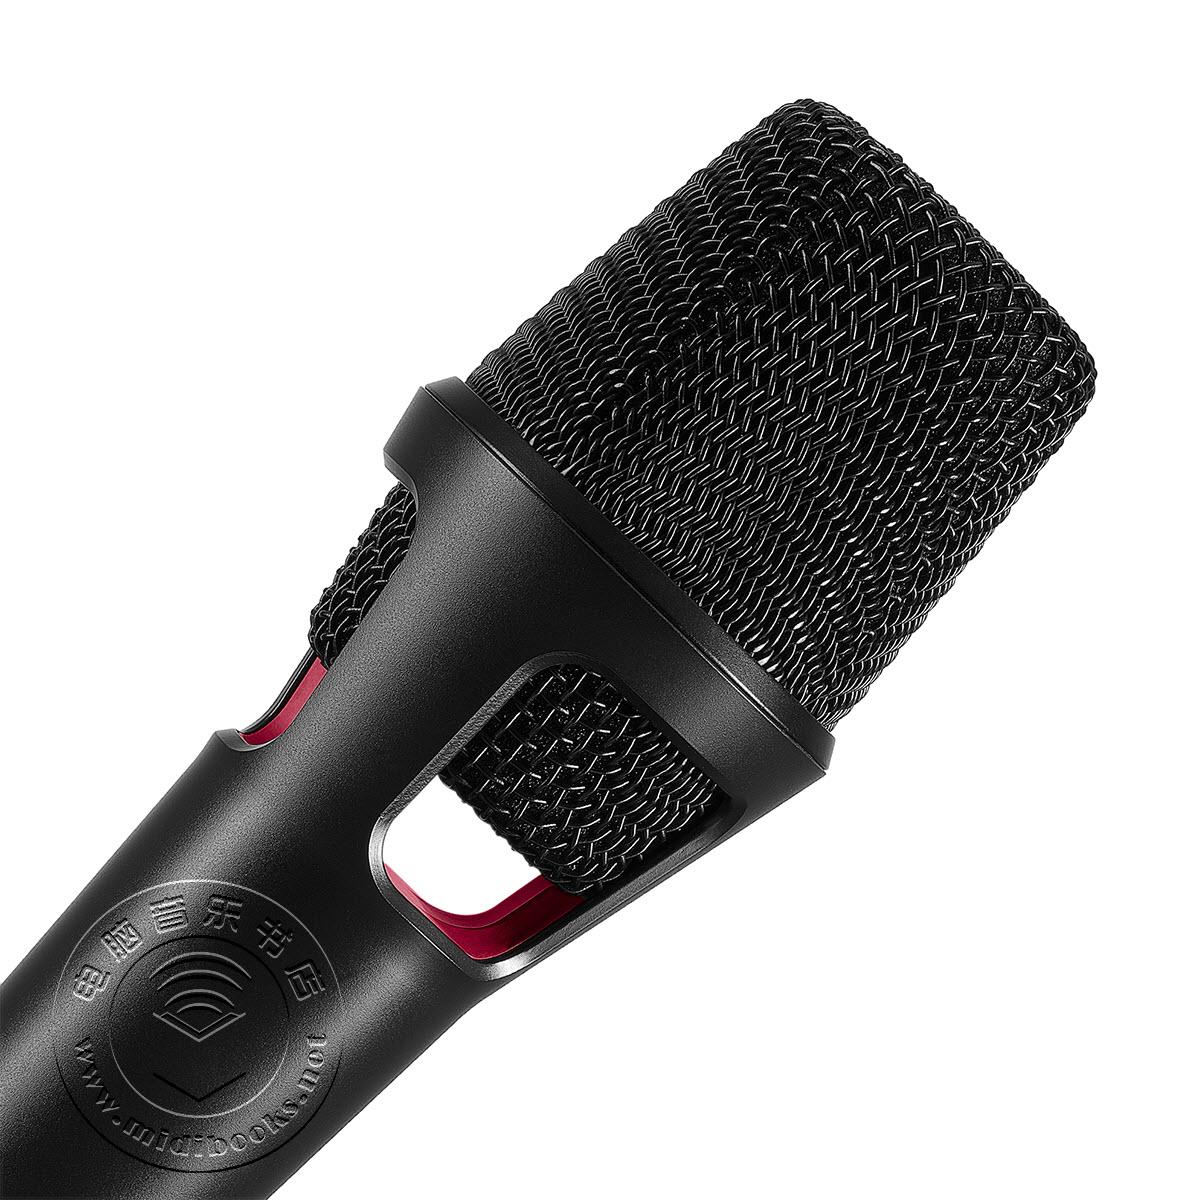 Austrian Audio发布新款舞台动圈话筒OD505和手持电容话筒OC707(视频)